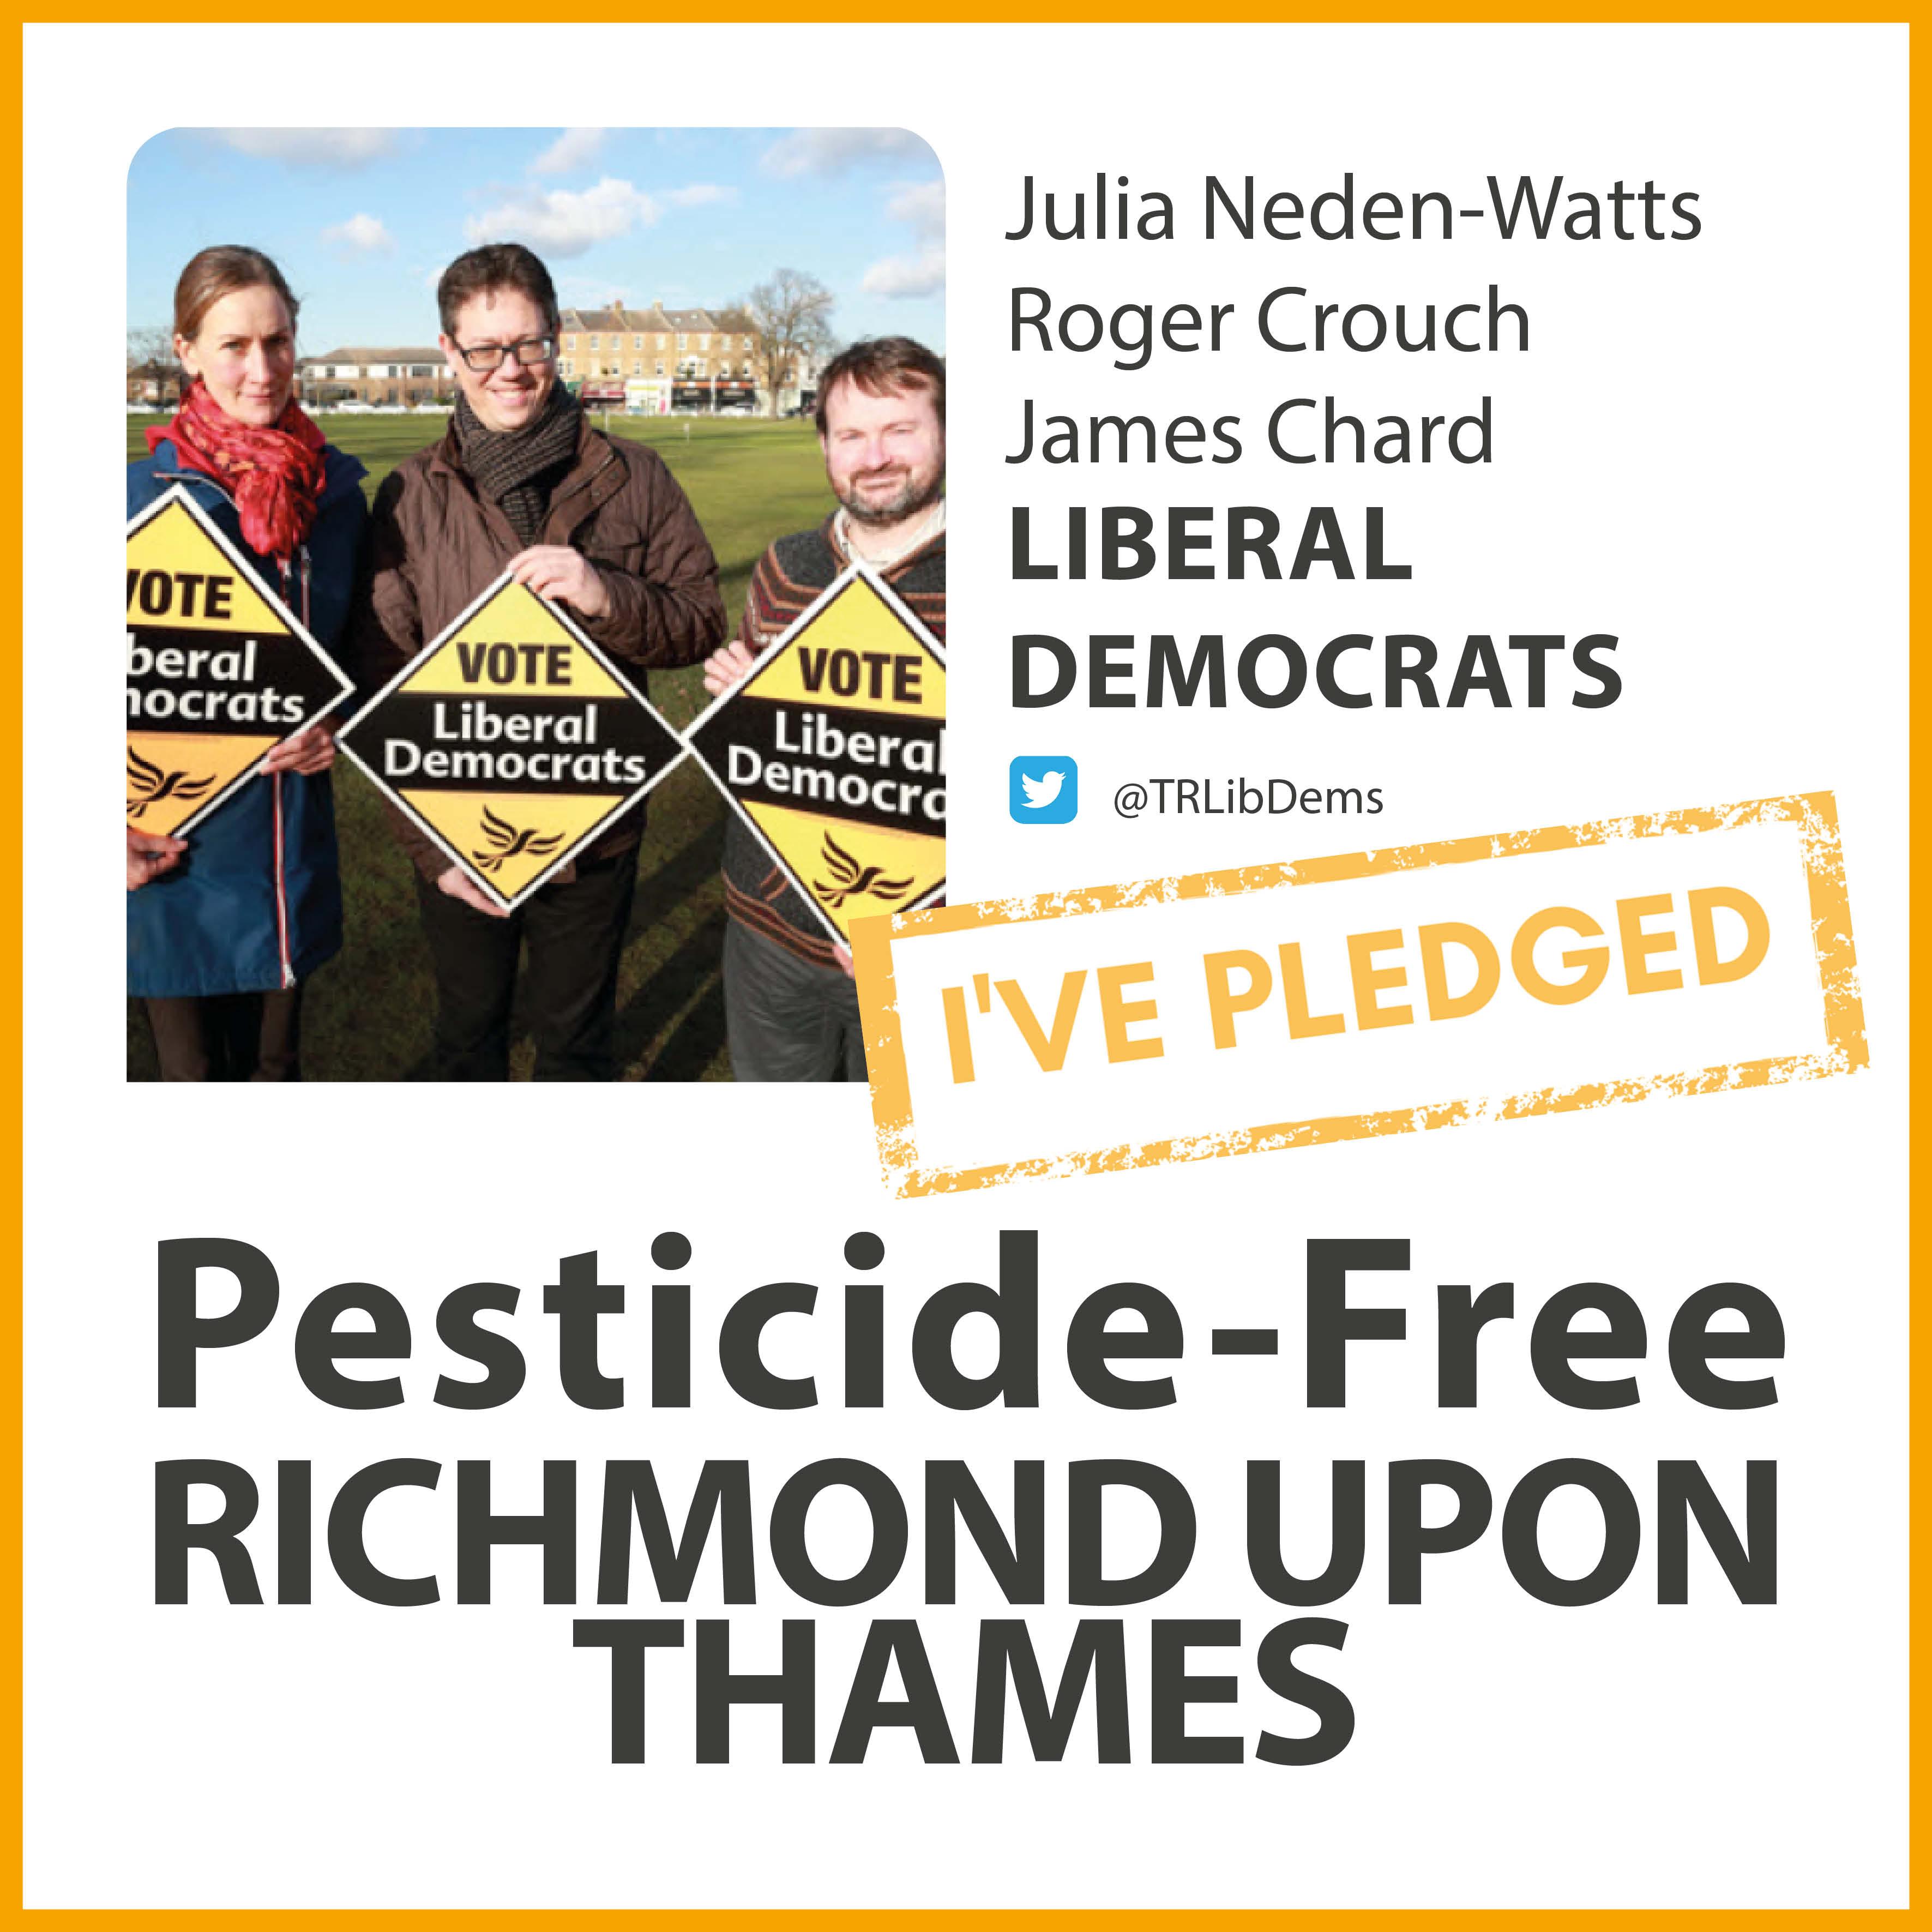 Twickenham Riverside Lib Dems have taken the pesticide-free pledge